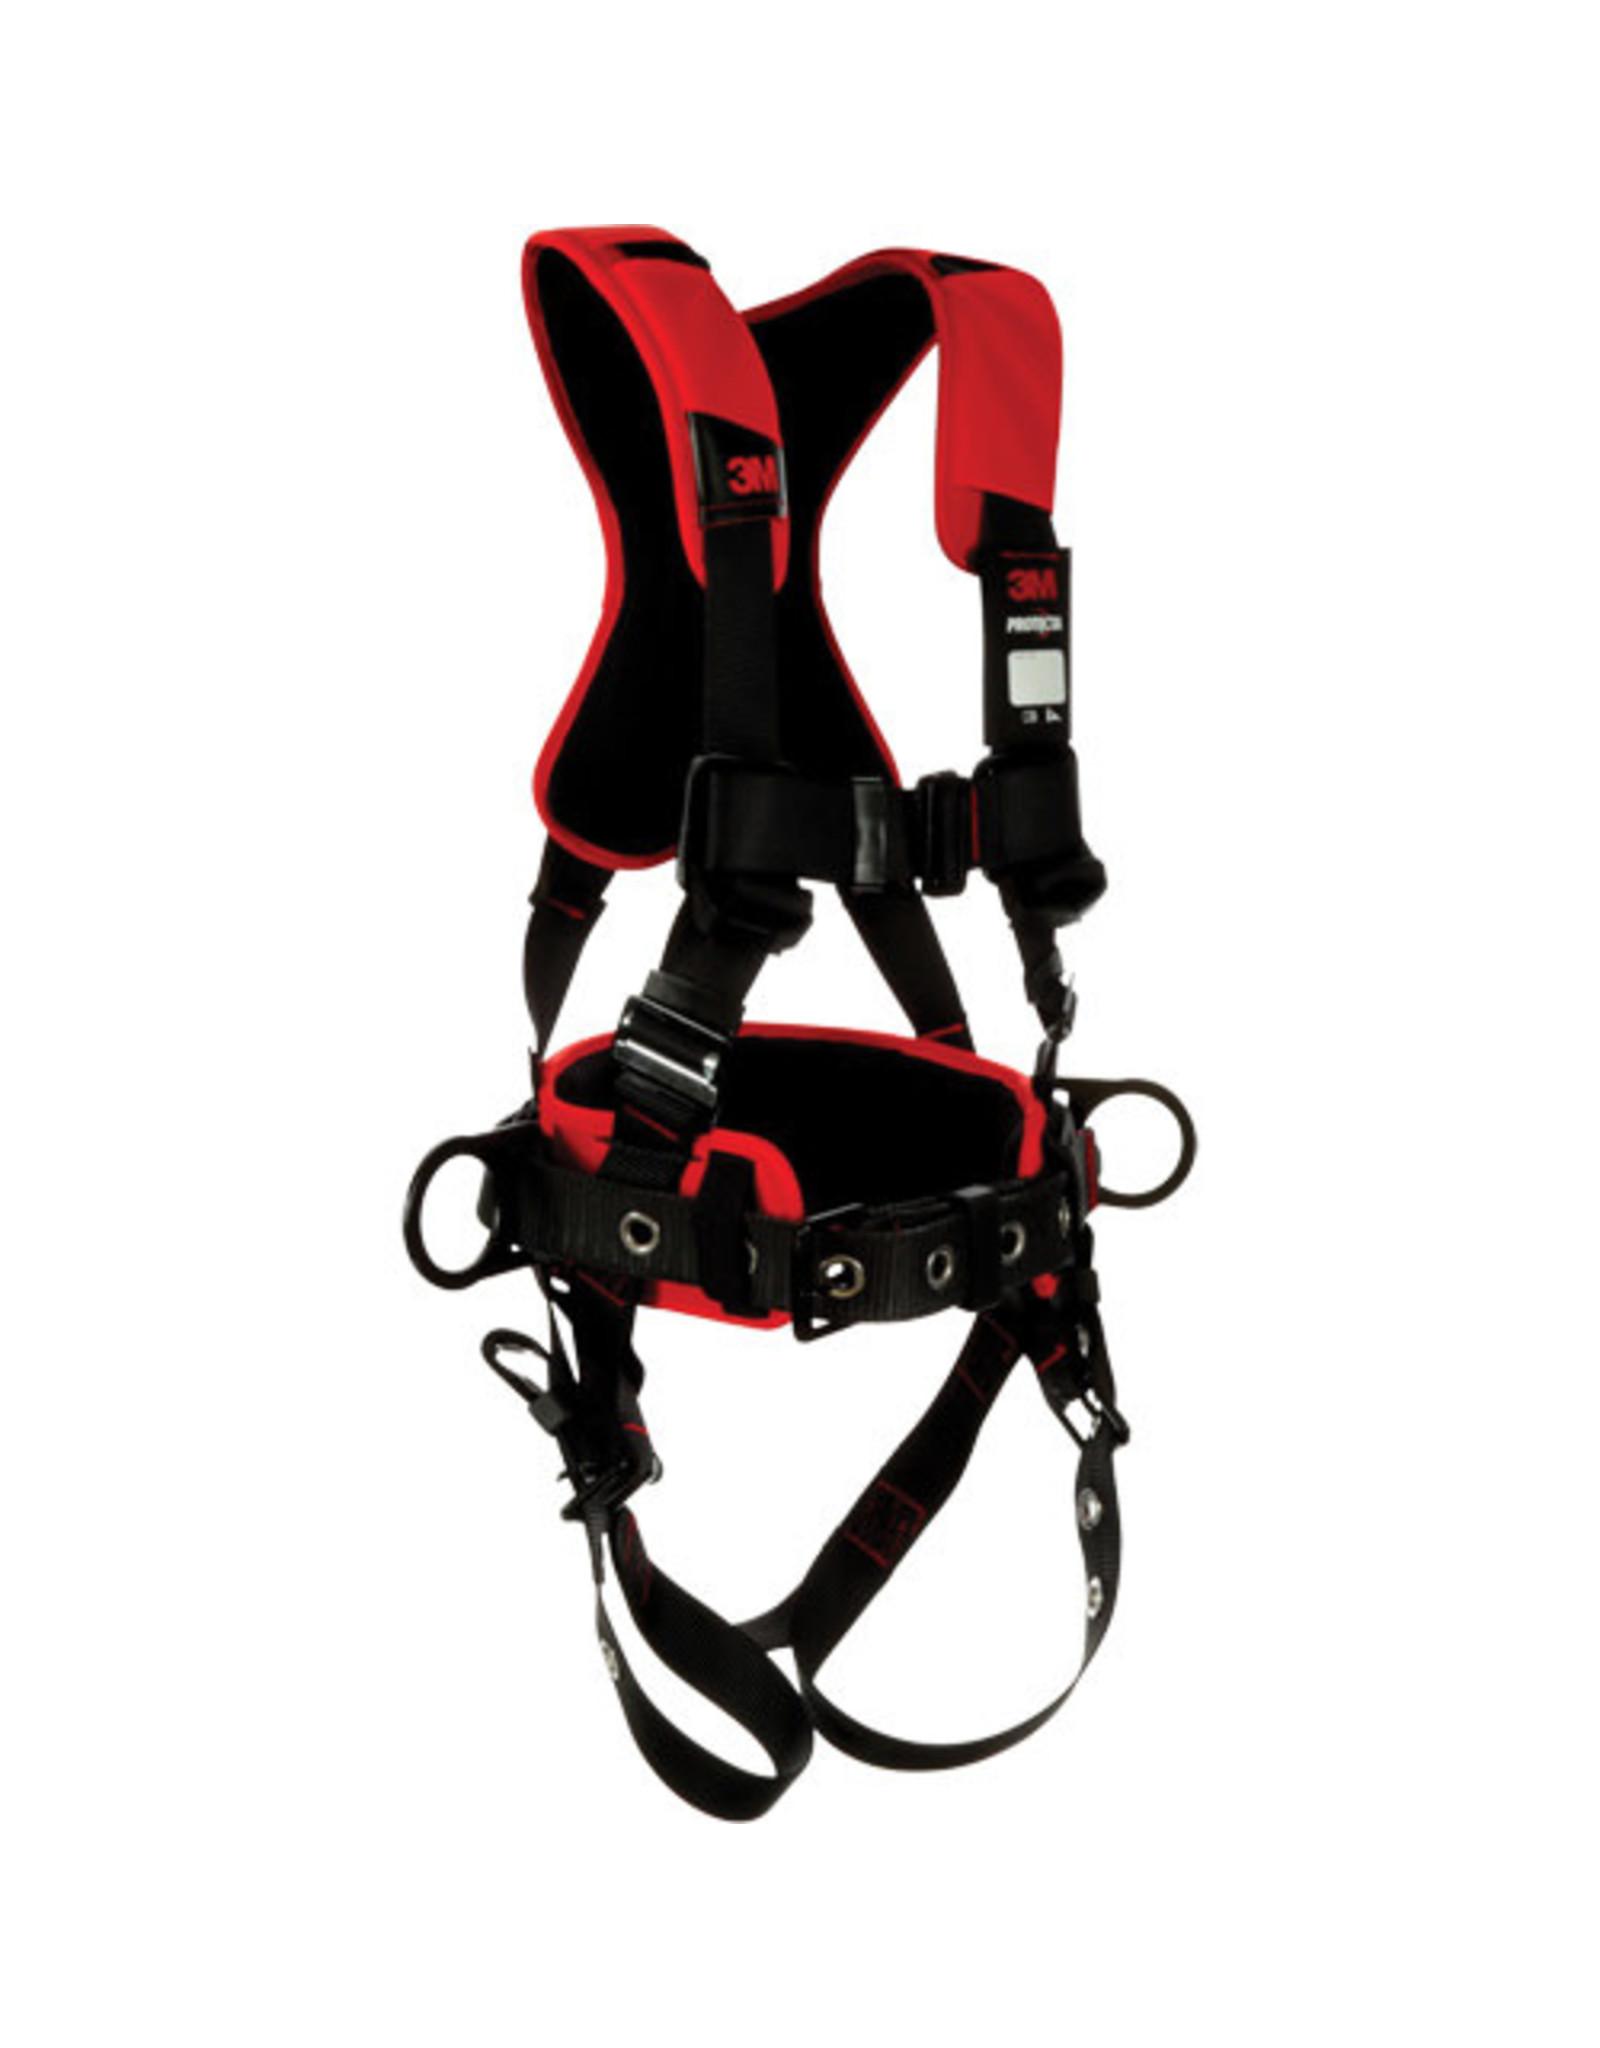 3M 3M Protecta Comfort Harness, Class AP, 420 lb cap, Med/Large Fit